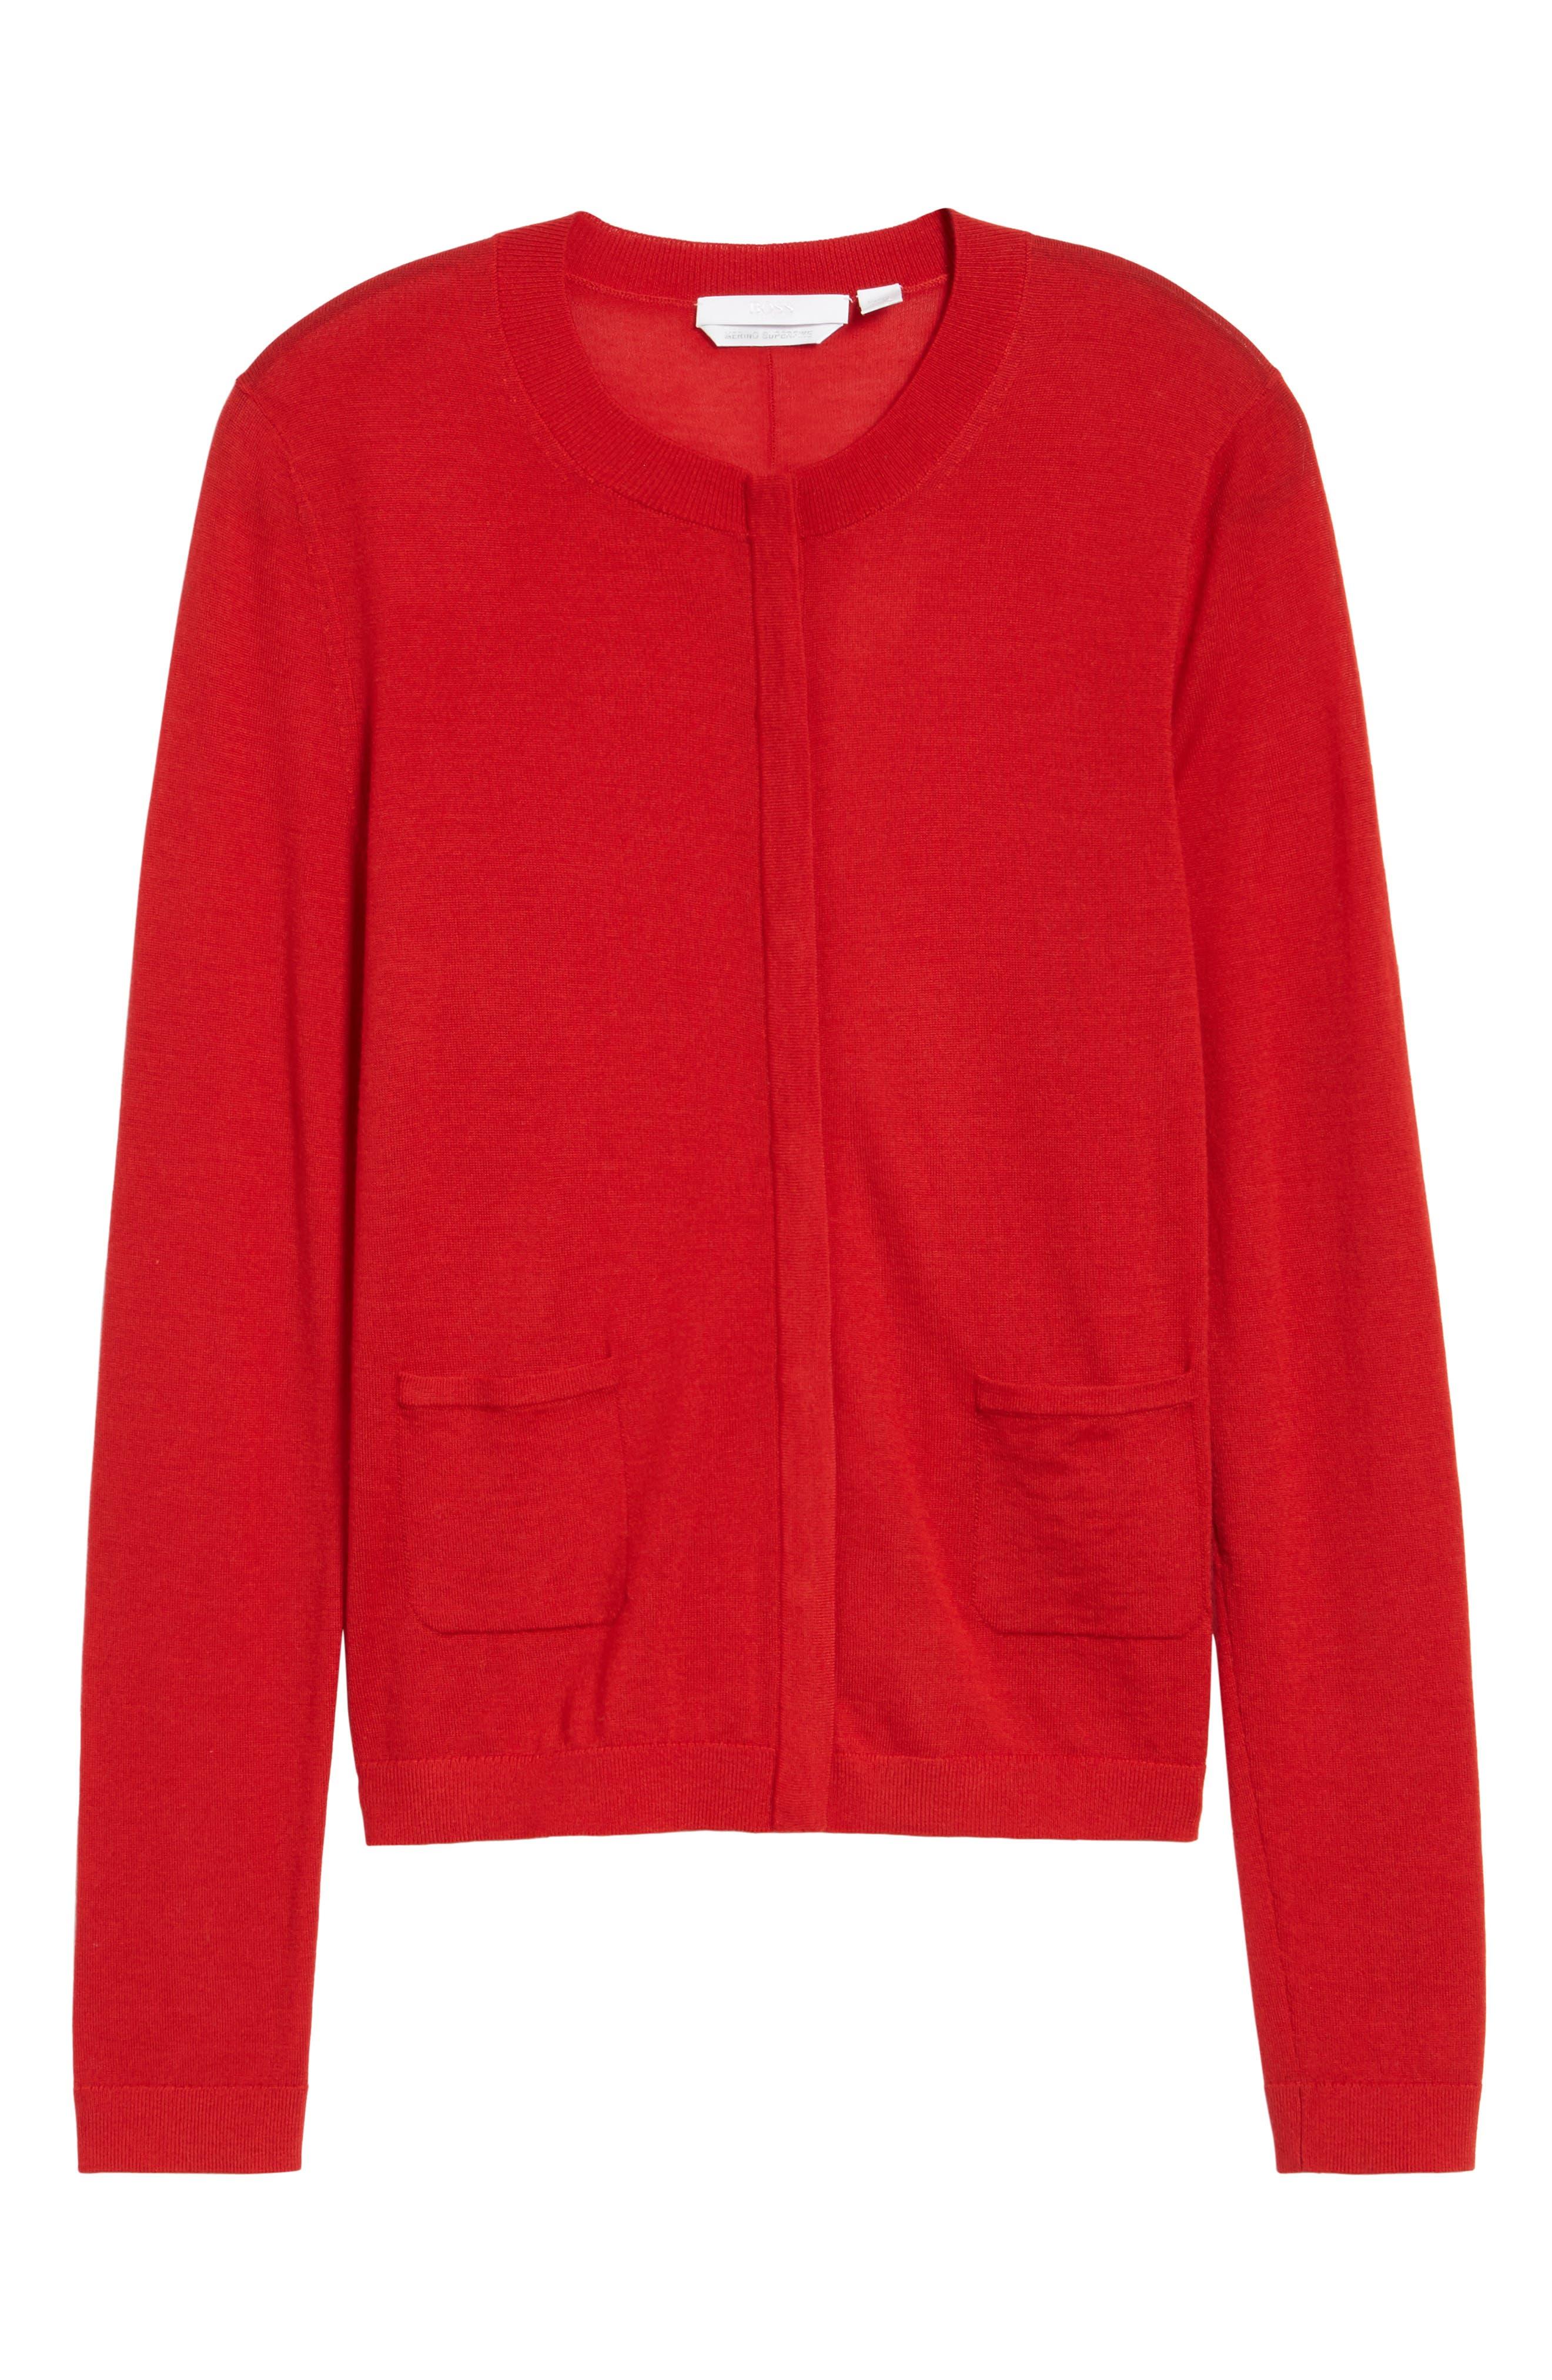 Fuyuma Wool Cardigan,                             Alternate thumbnail 6, color,                             Crimson Red